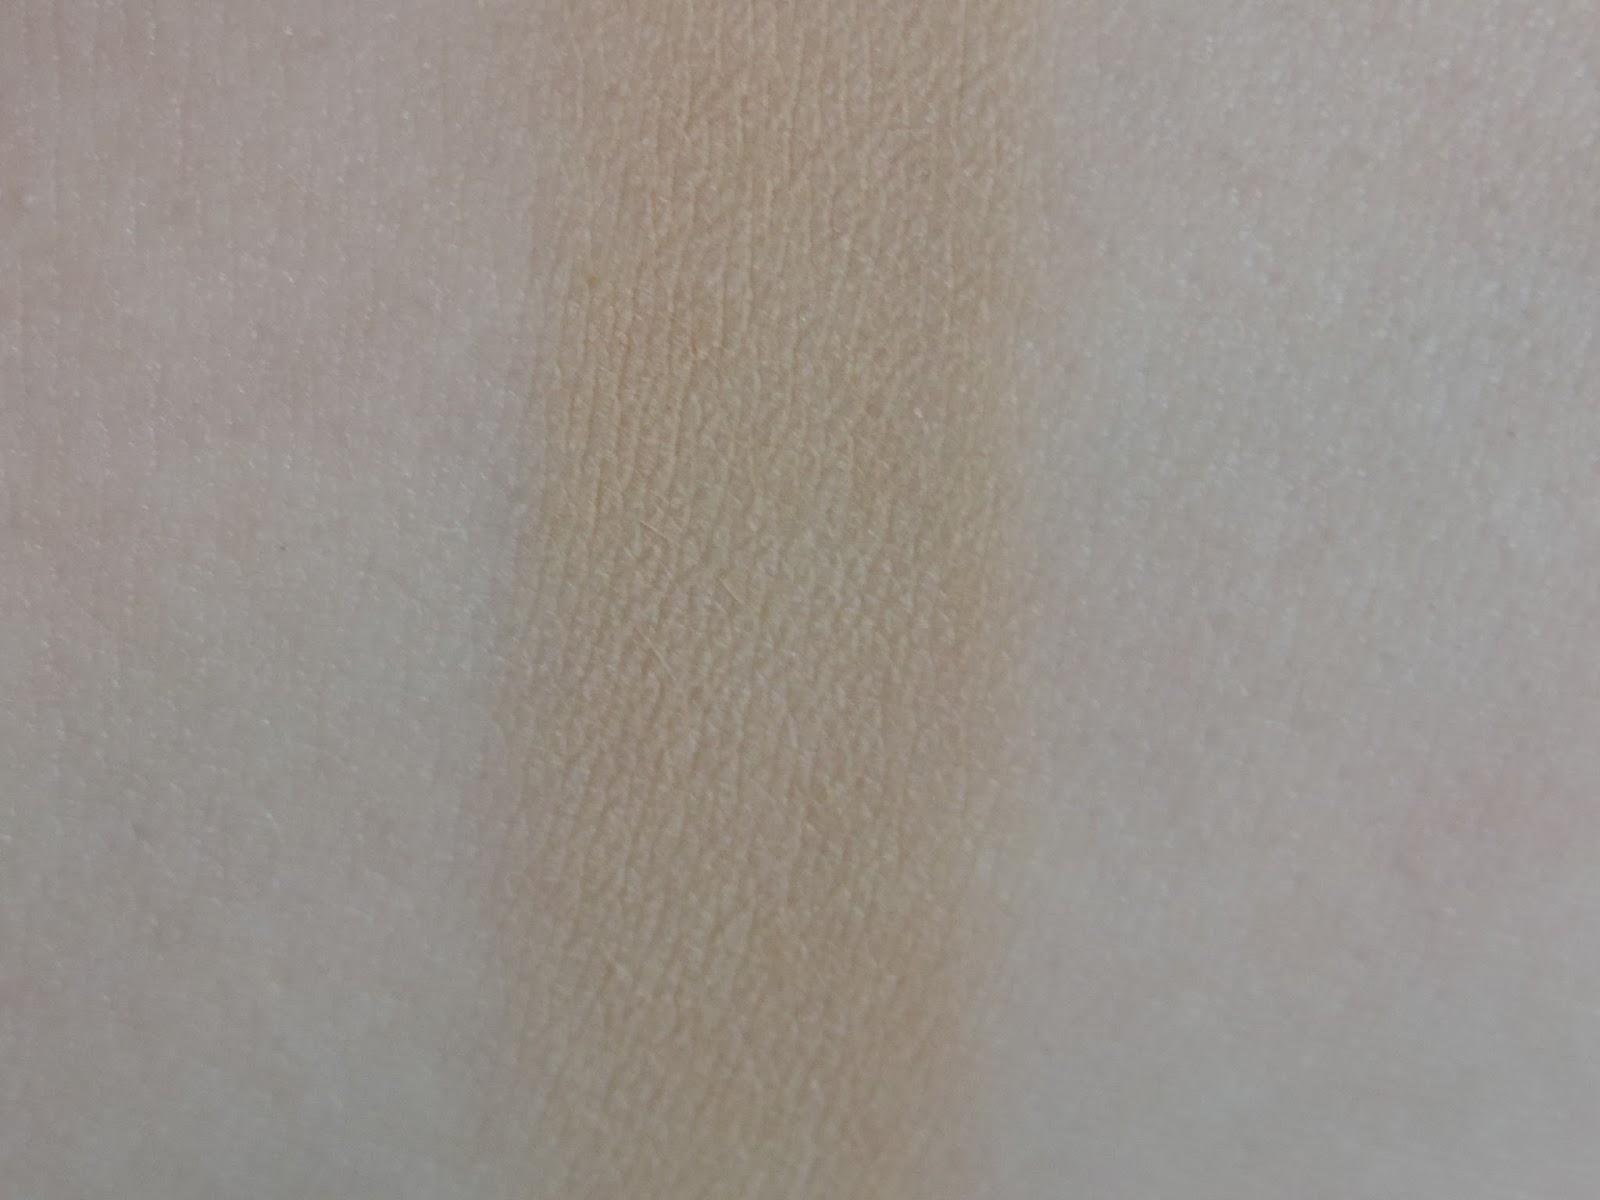 Swatch of Urban Decay Naked Skin Ultra Definition Powder Foundation in Medium Neutral